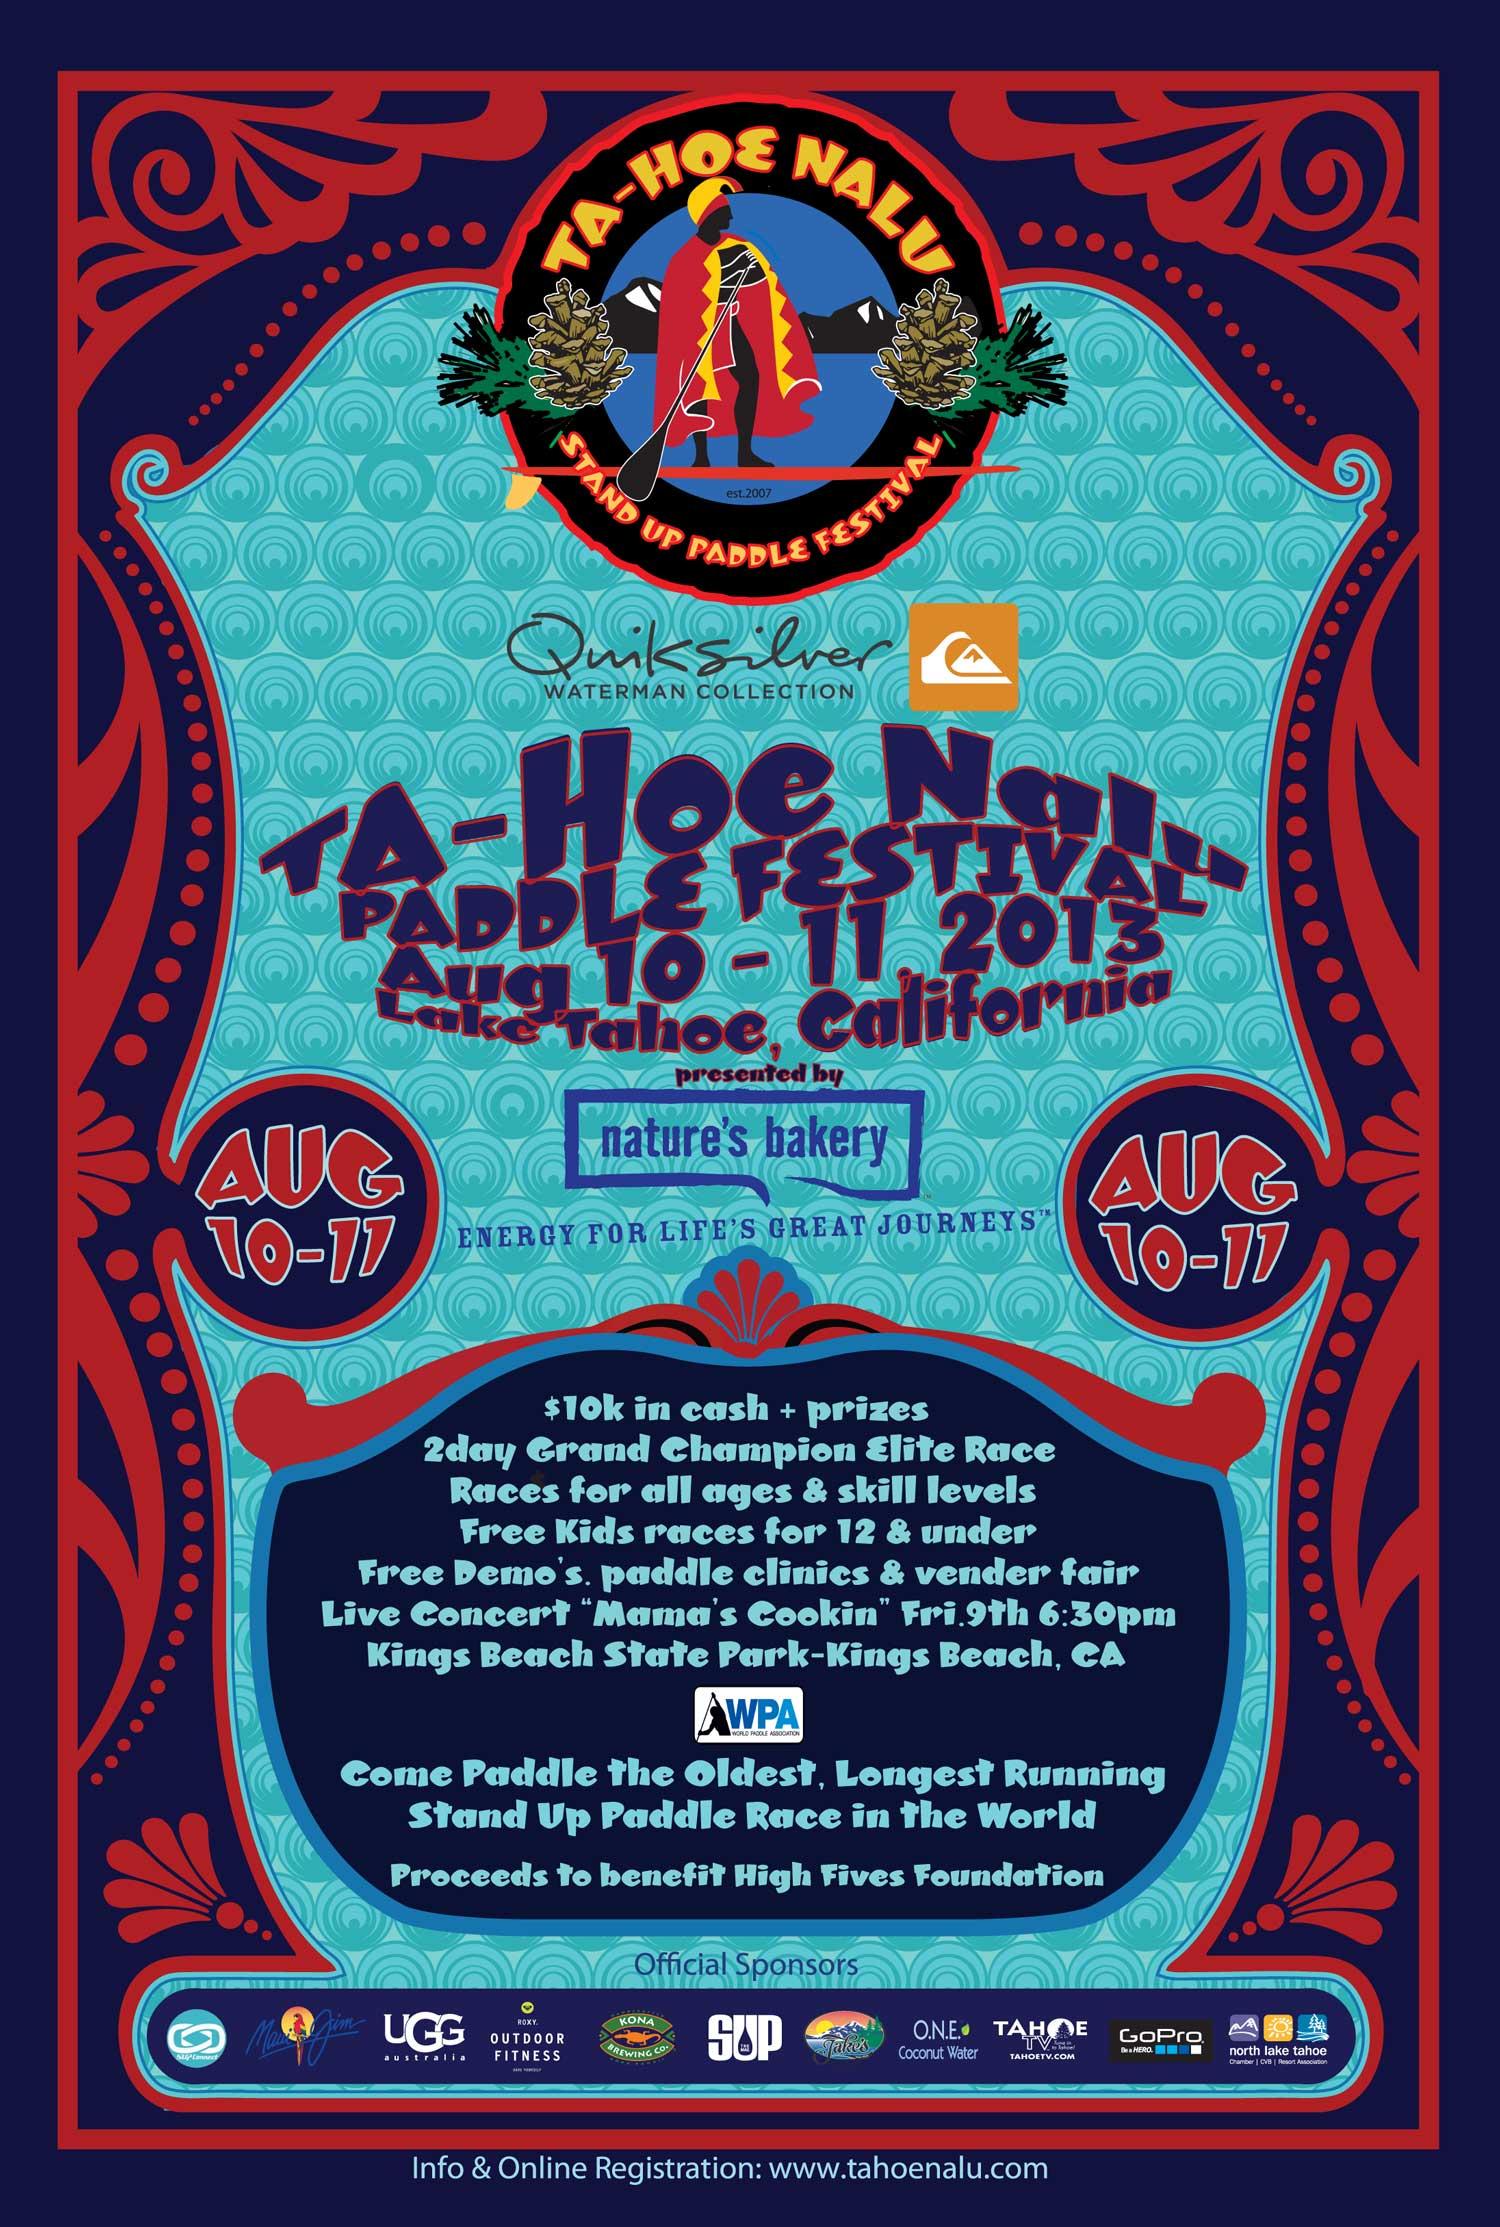 2013 TA-HOE NALU PADDLE FESTIVAL